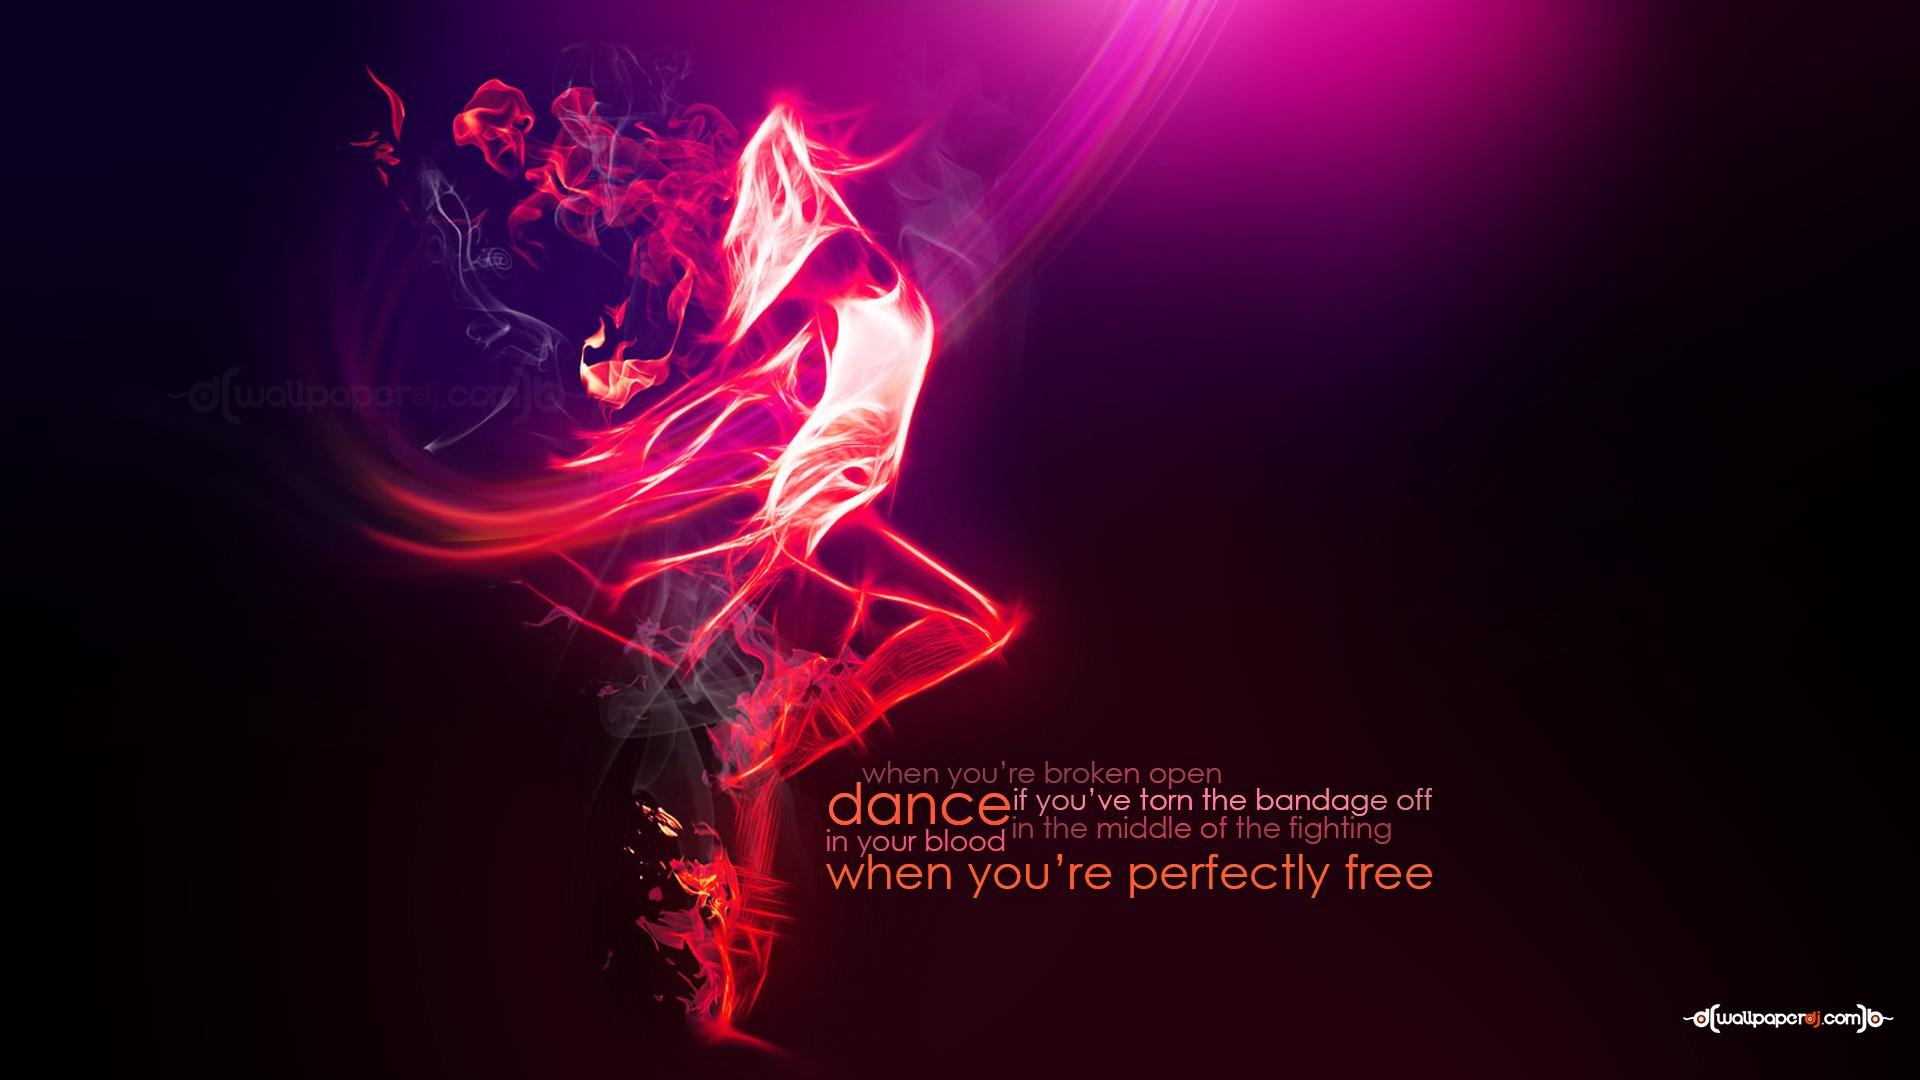 dance wallpaper cool girl - photo #39